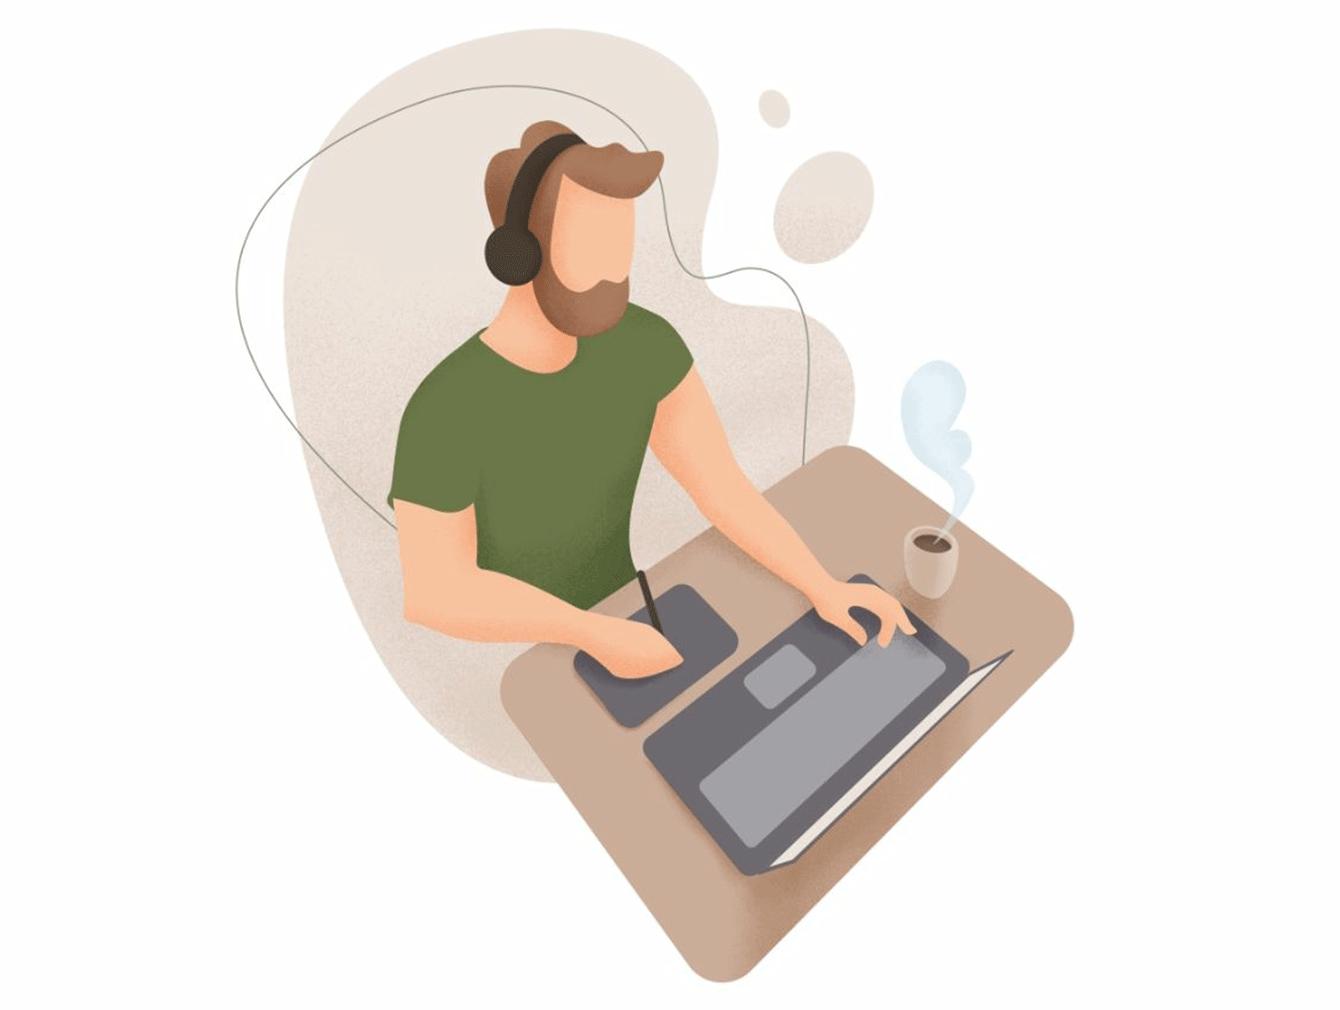 Hiring a Django freelance developer. Dribble shot